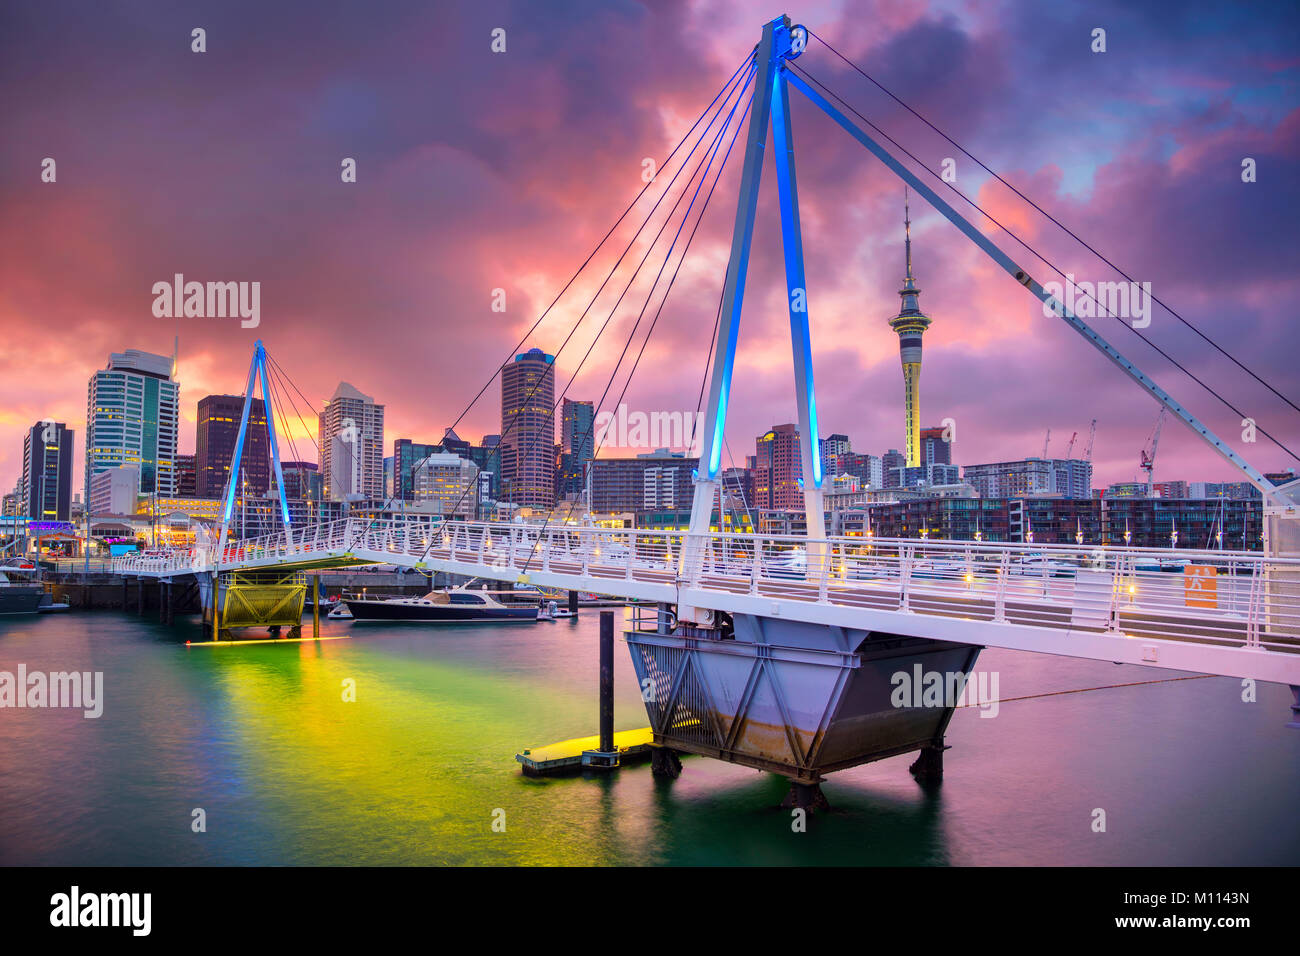 Auckland. Cityscape image of Auckland skyline, New Zealand during sunrise. - Stock Image